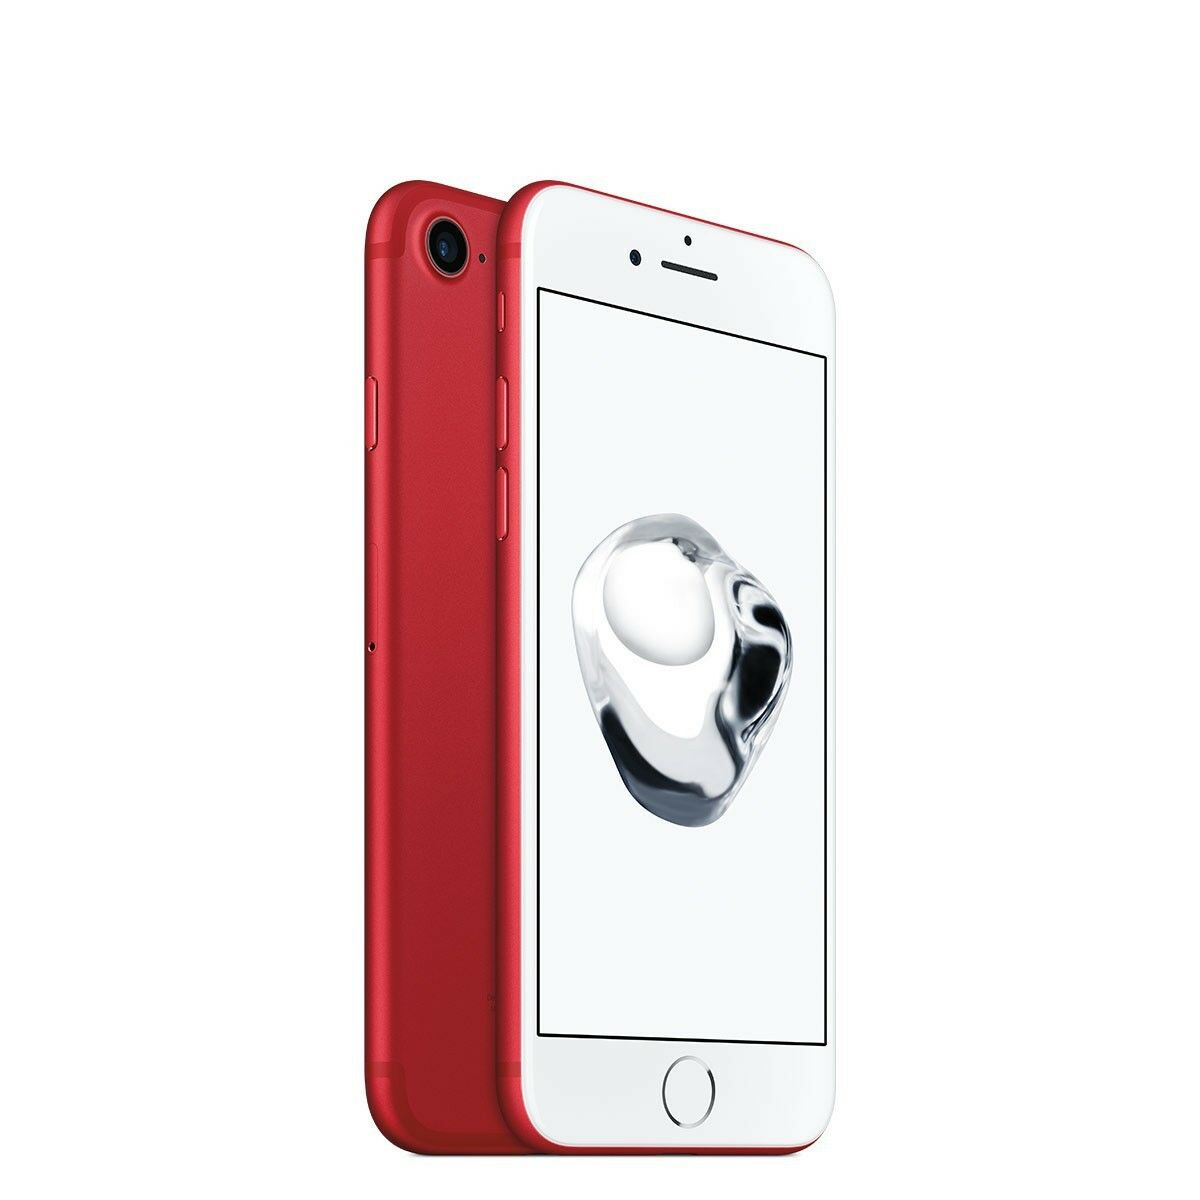 Apple iPhone 7 4G LTE (Unlocked) 128GB Smartphone 1-Year Warranty SR